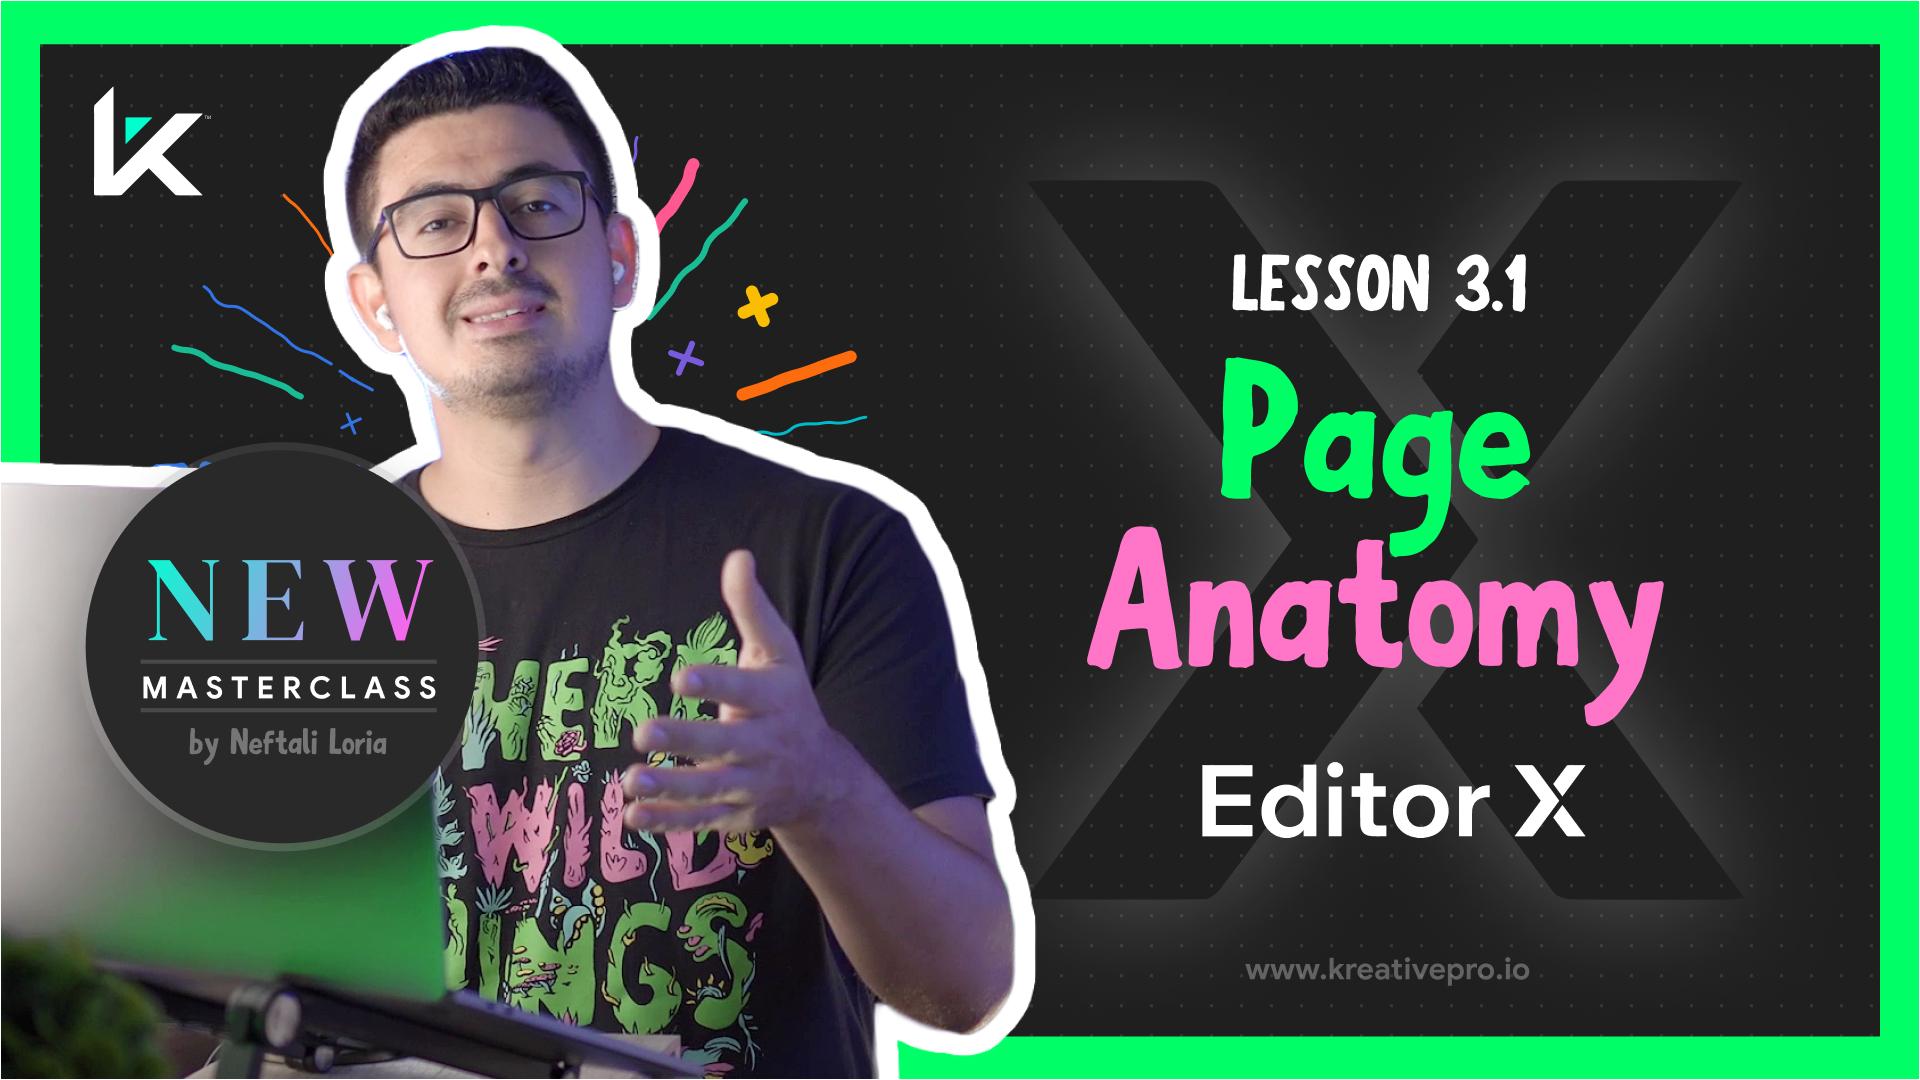 Editor X 3.1 - Editor X Page Anatomy